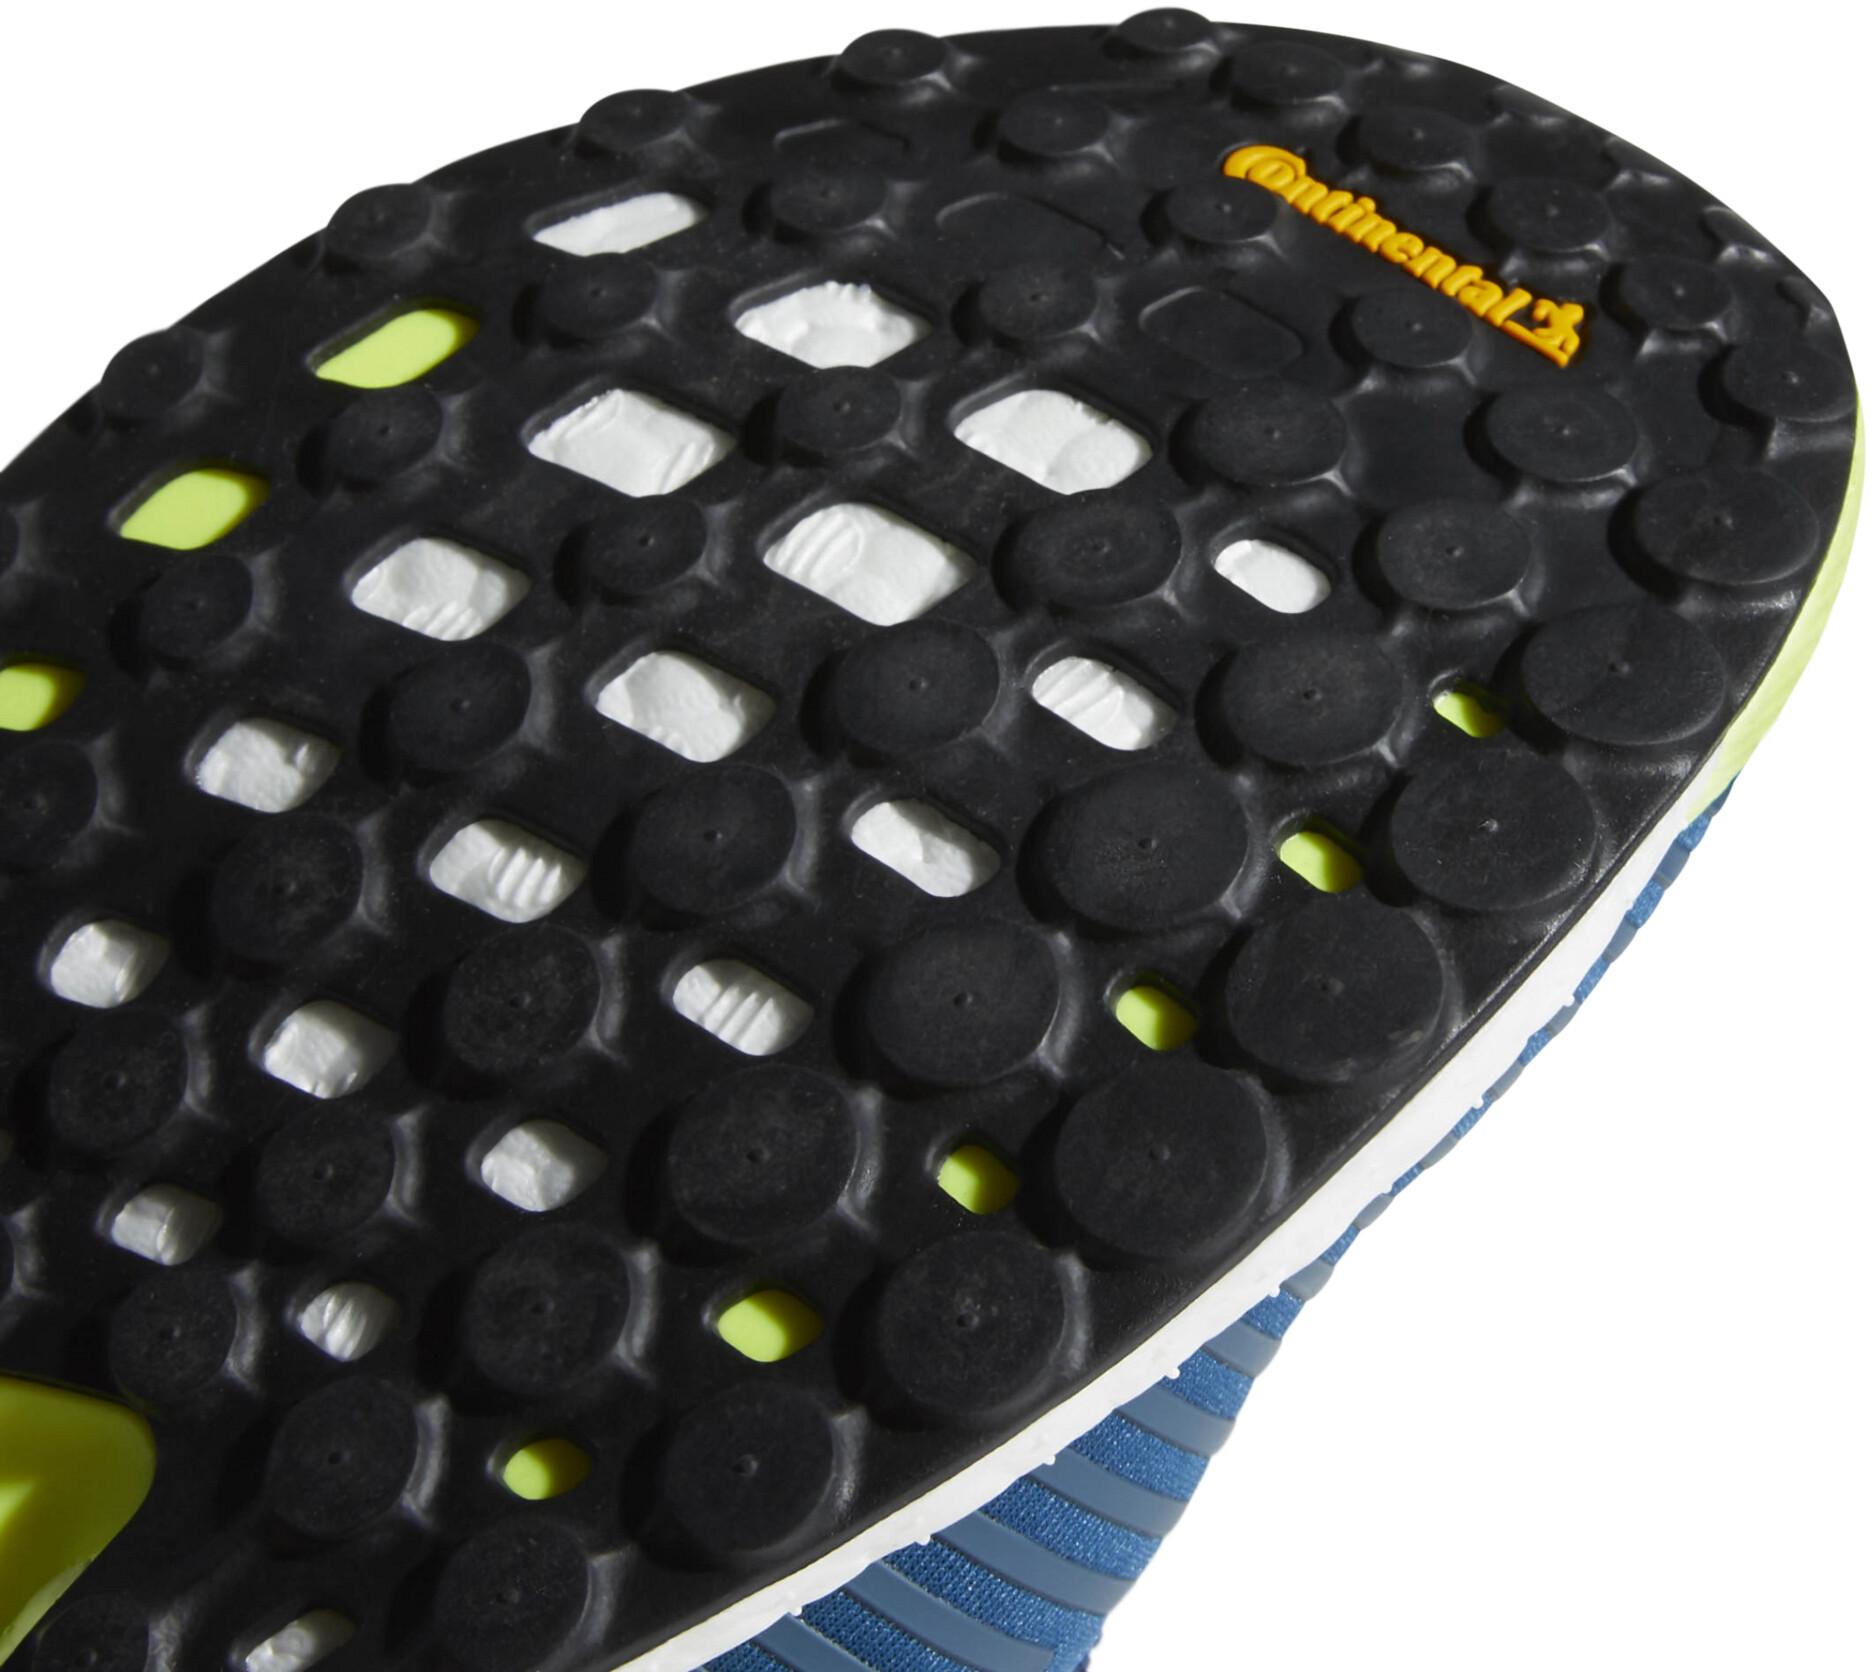 adidas SolarBoost Scarpe da corsa Uomo, legend marine/ash grey/hi-res yellow  879960 agsju